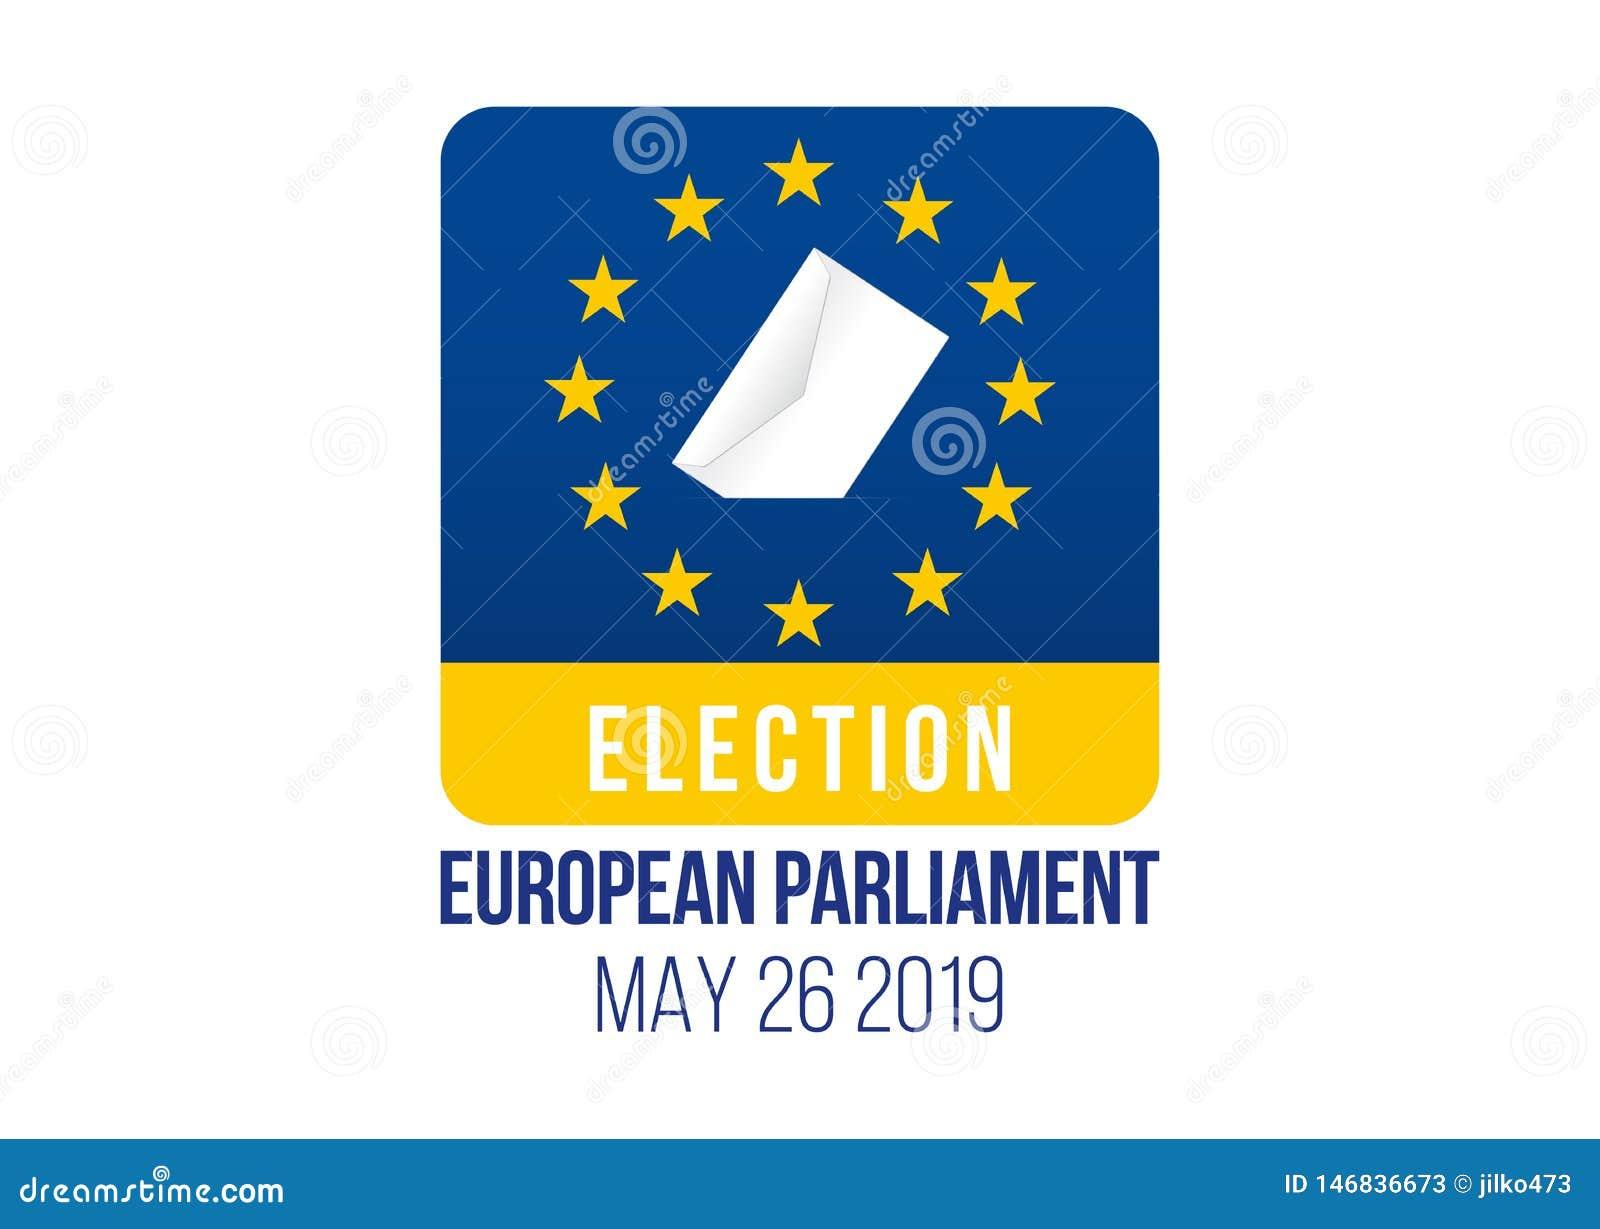 2019 European Parliament election